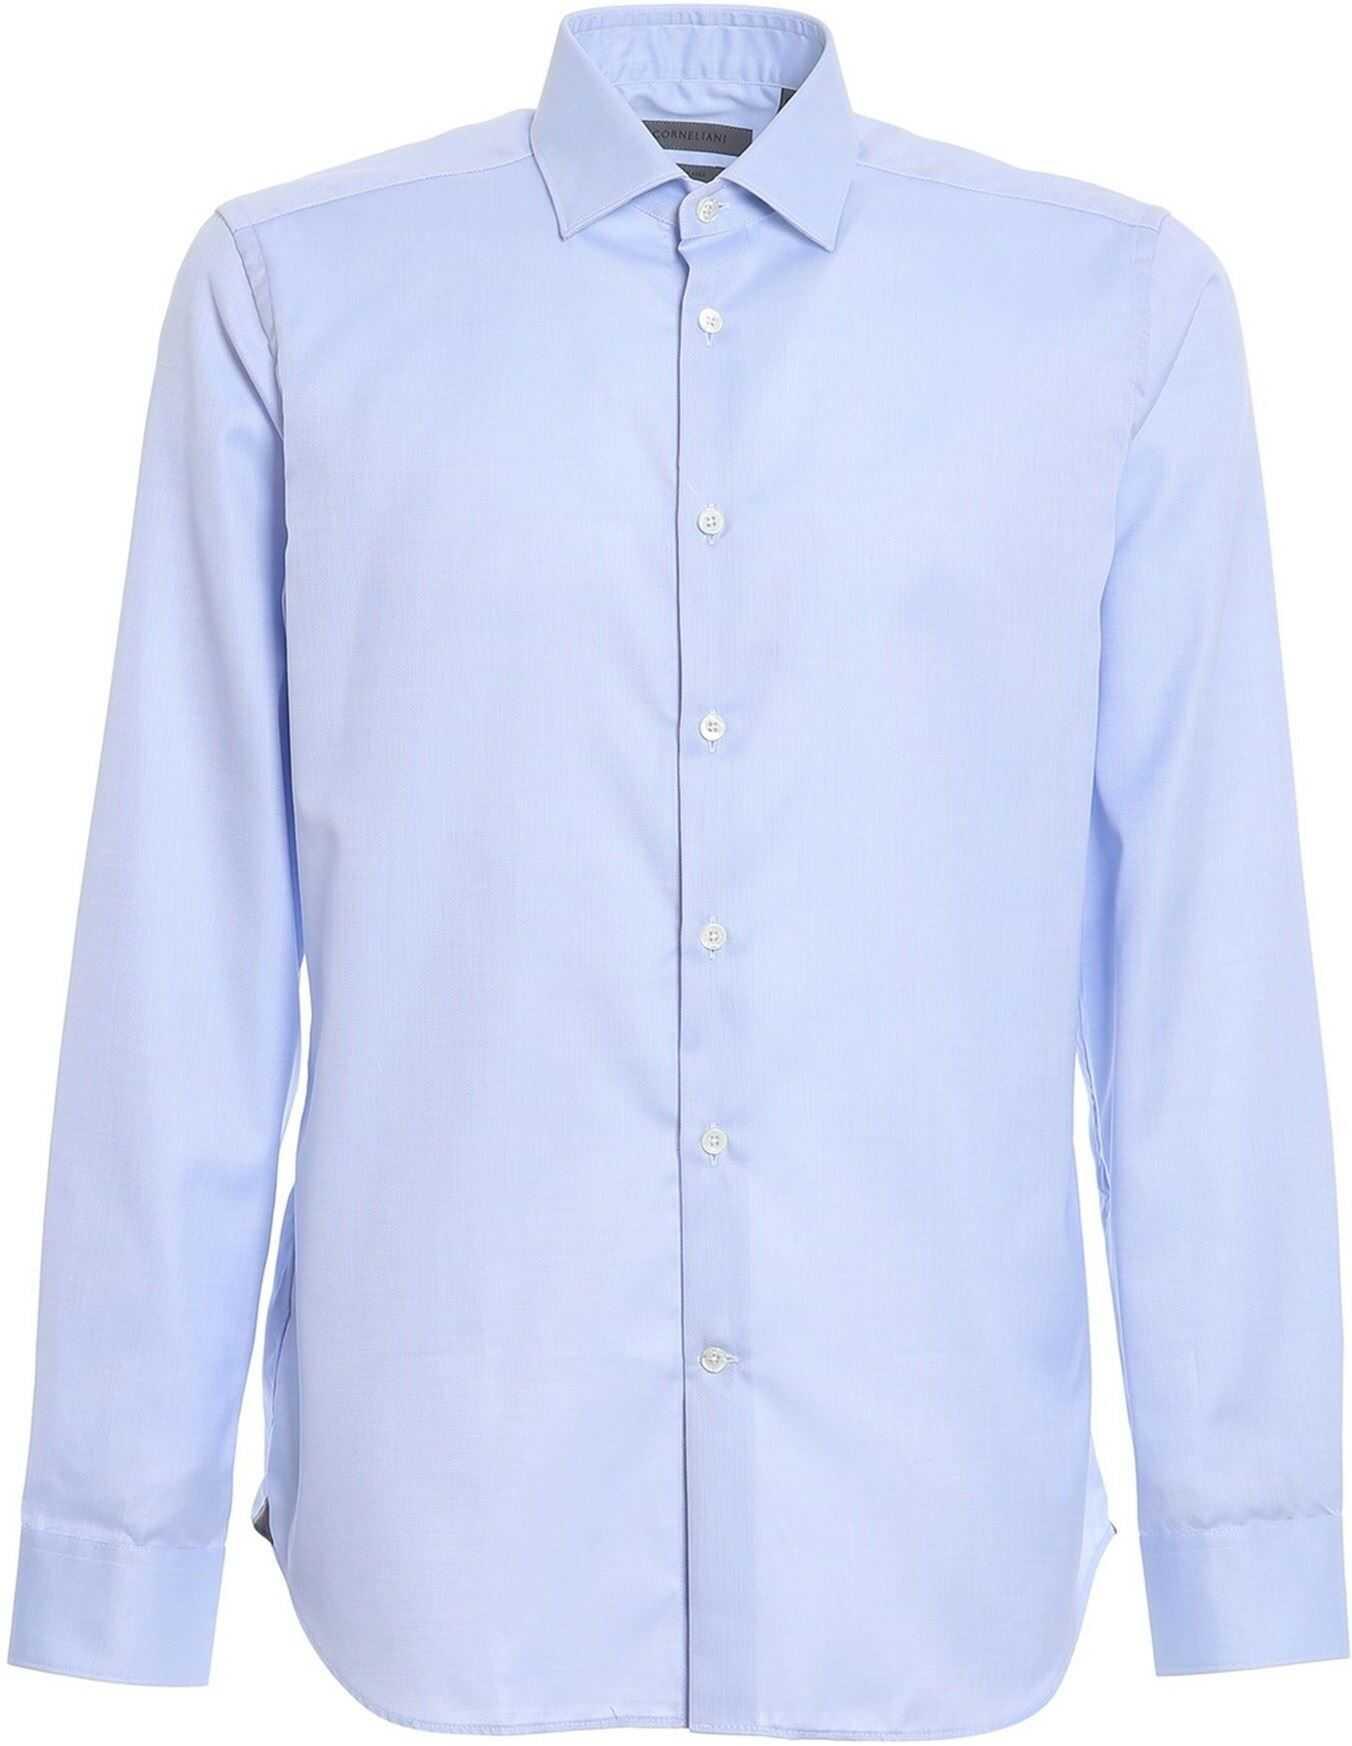 CORNELIANI Cotton Shirt In Light Blue Light Blue imagine